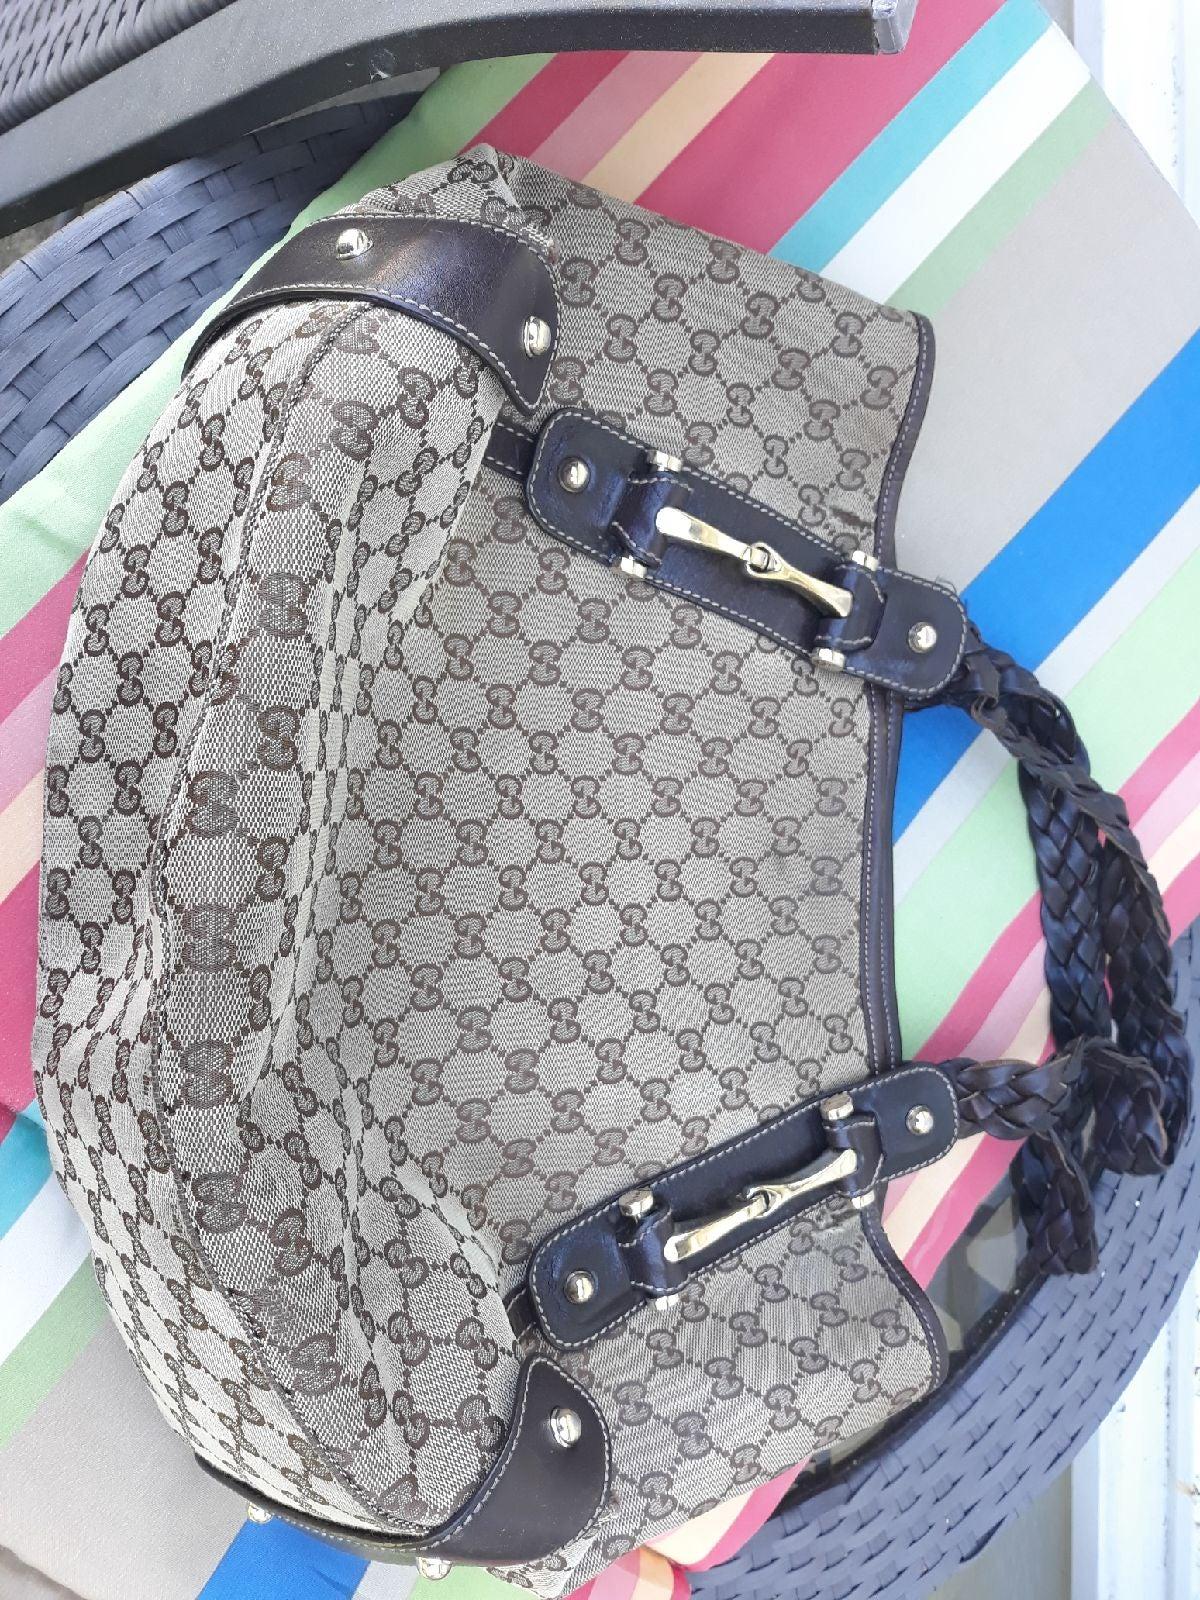 Authentic Gucci Flash sale